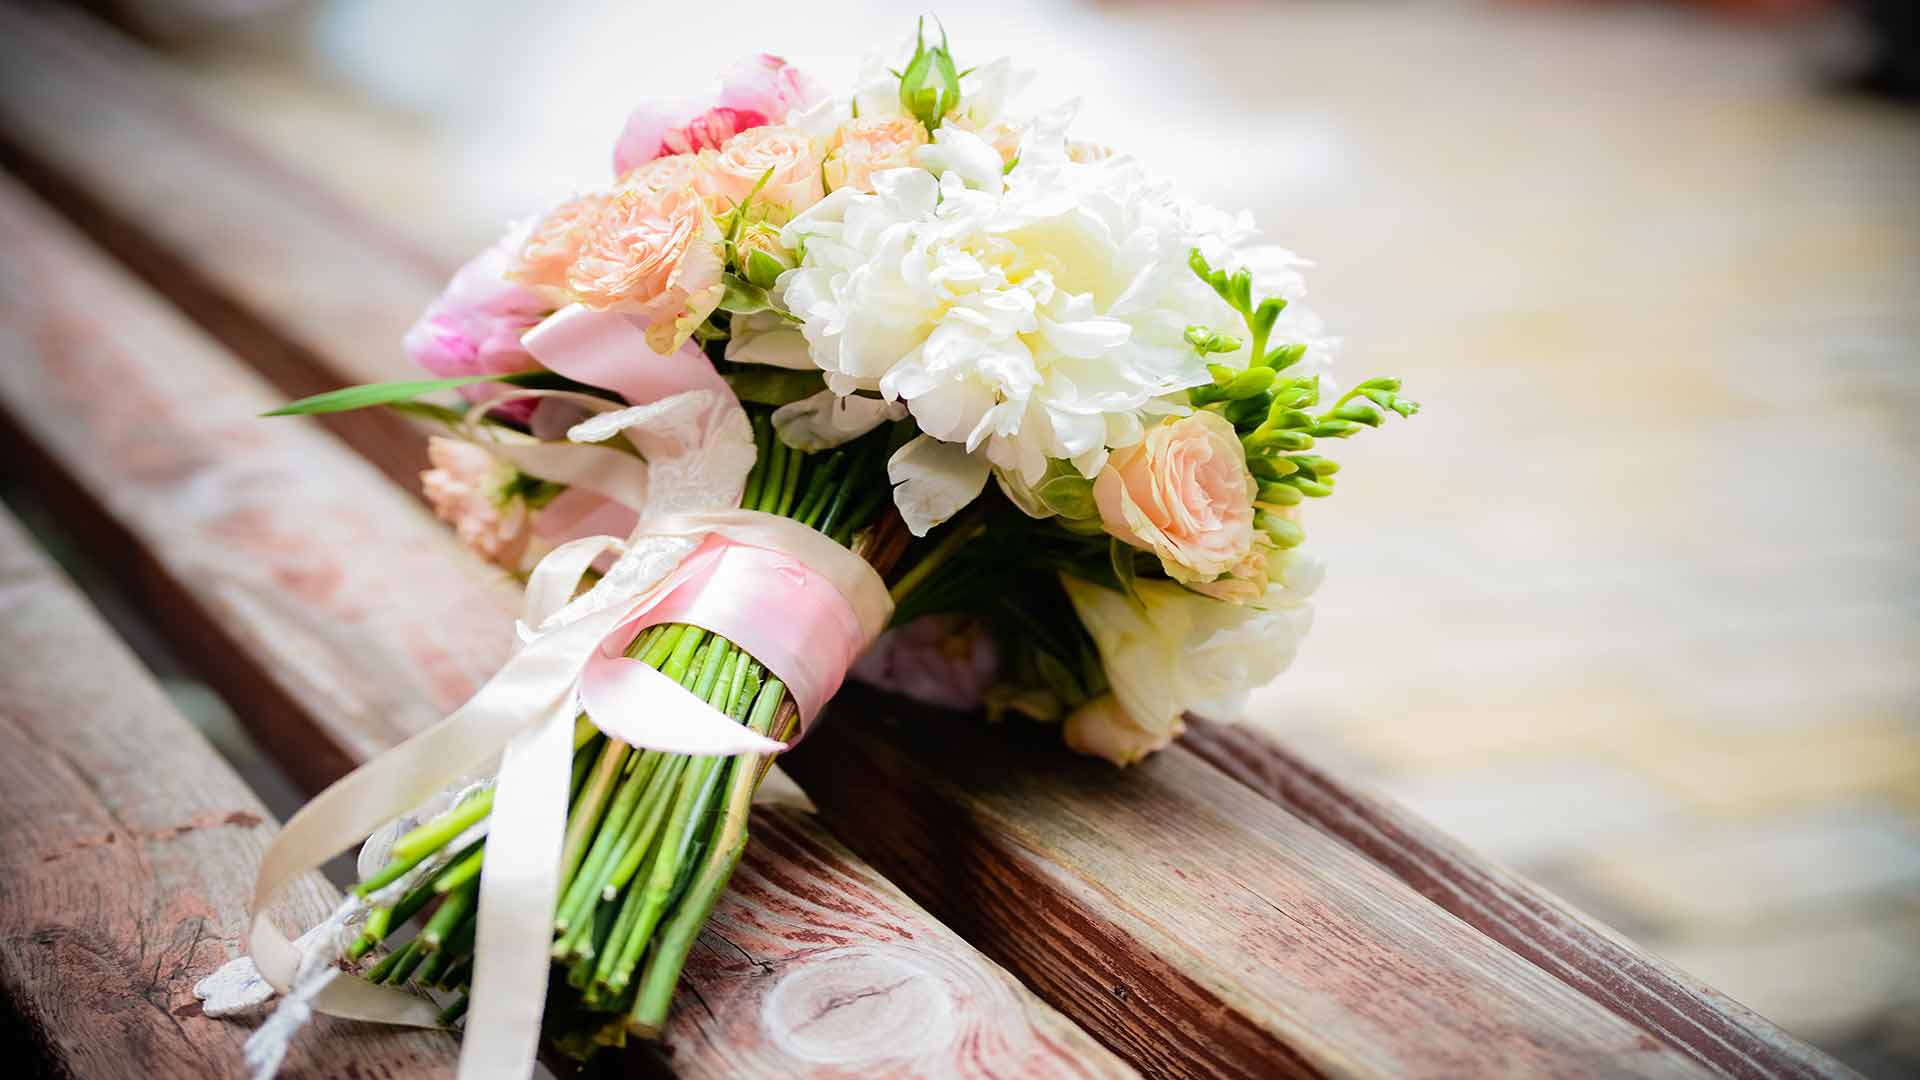 cost of wedding flowers photo - 1